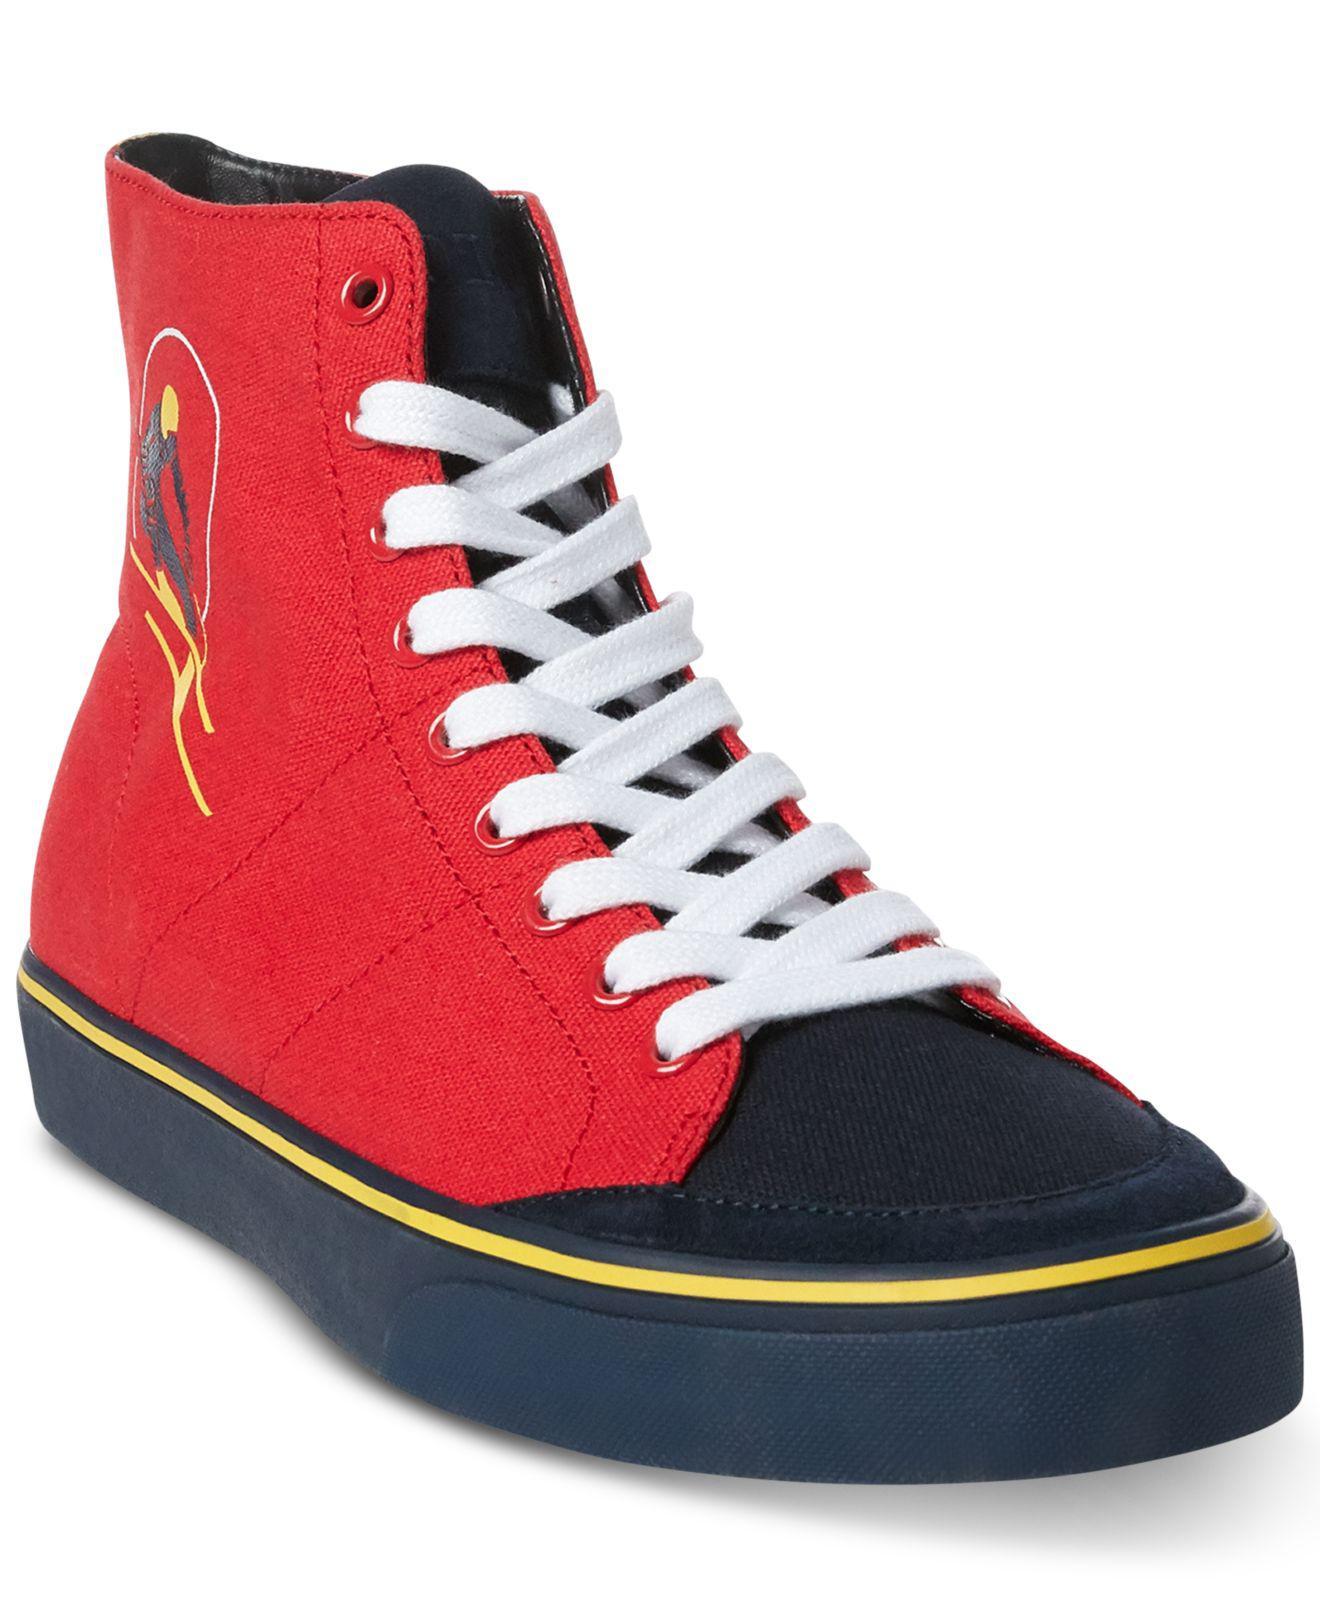 ee0696ddc99842 Lyst - Polo Ralph Lauren Solomon Ski-patch Sneakers